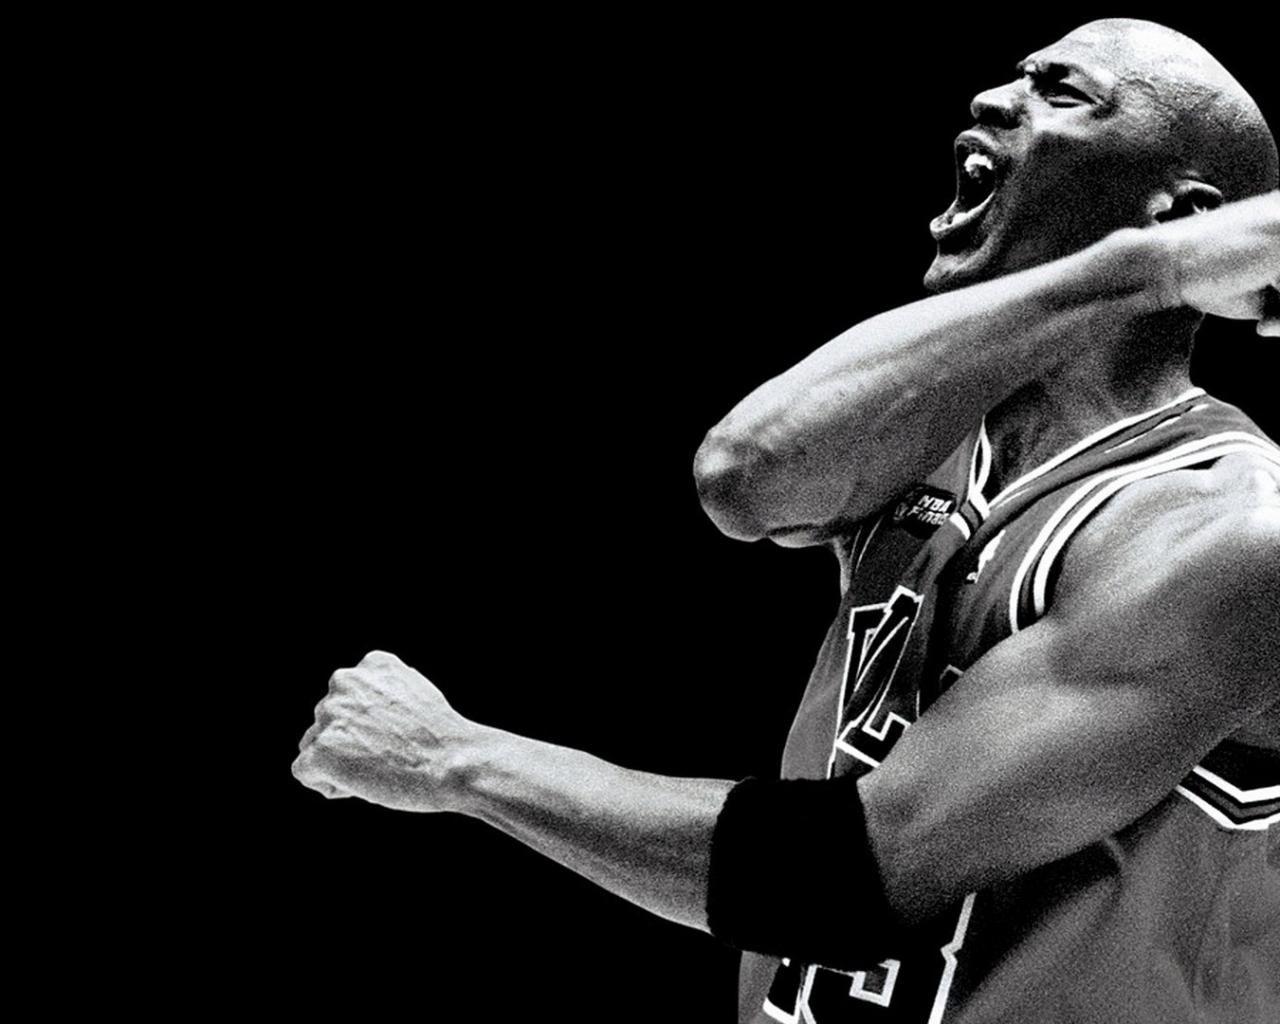 michael jordan athletes chicago bulls air Wallpaper Wallpapers 1280x1024